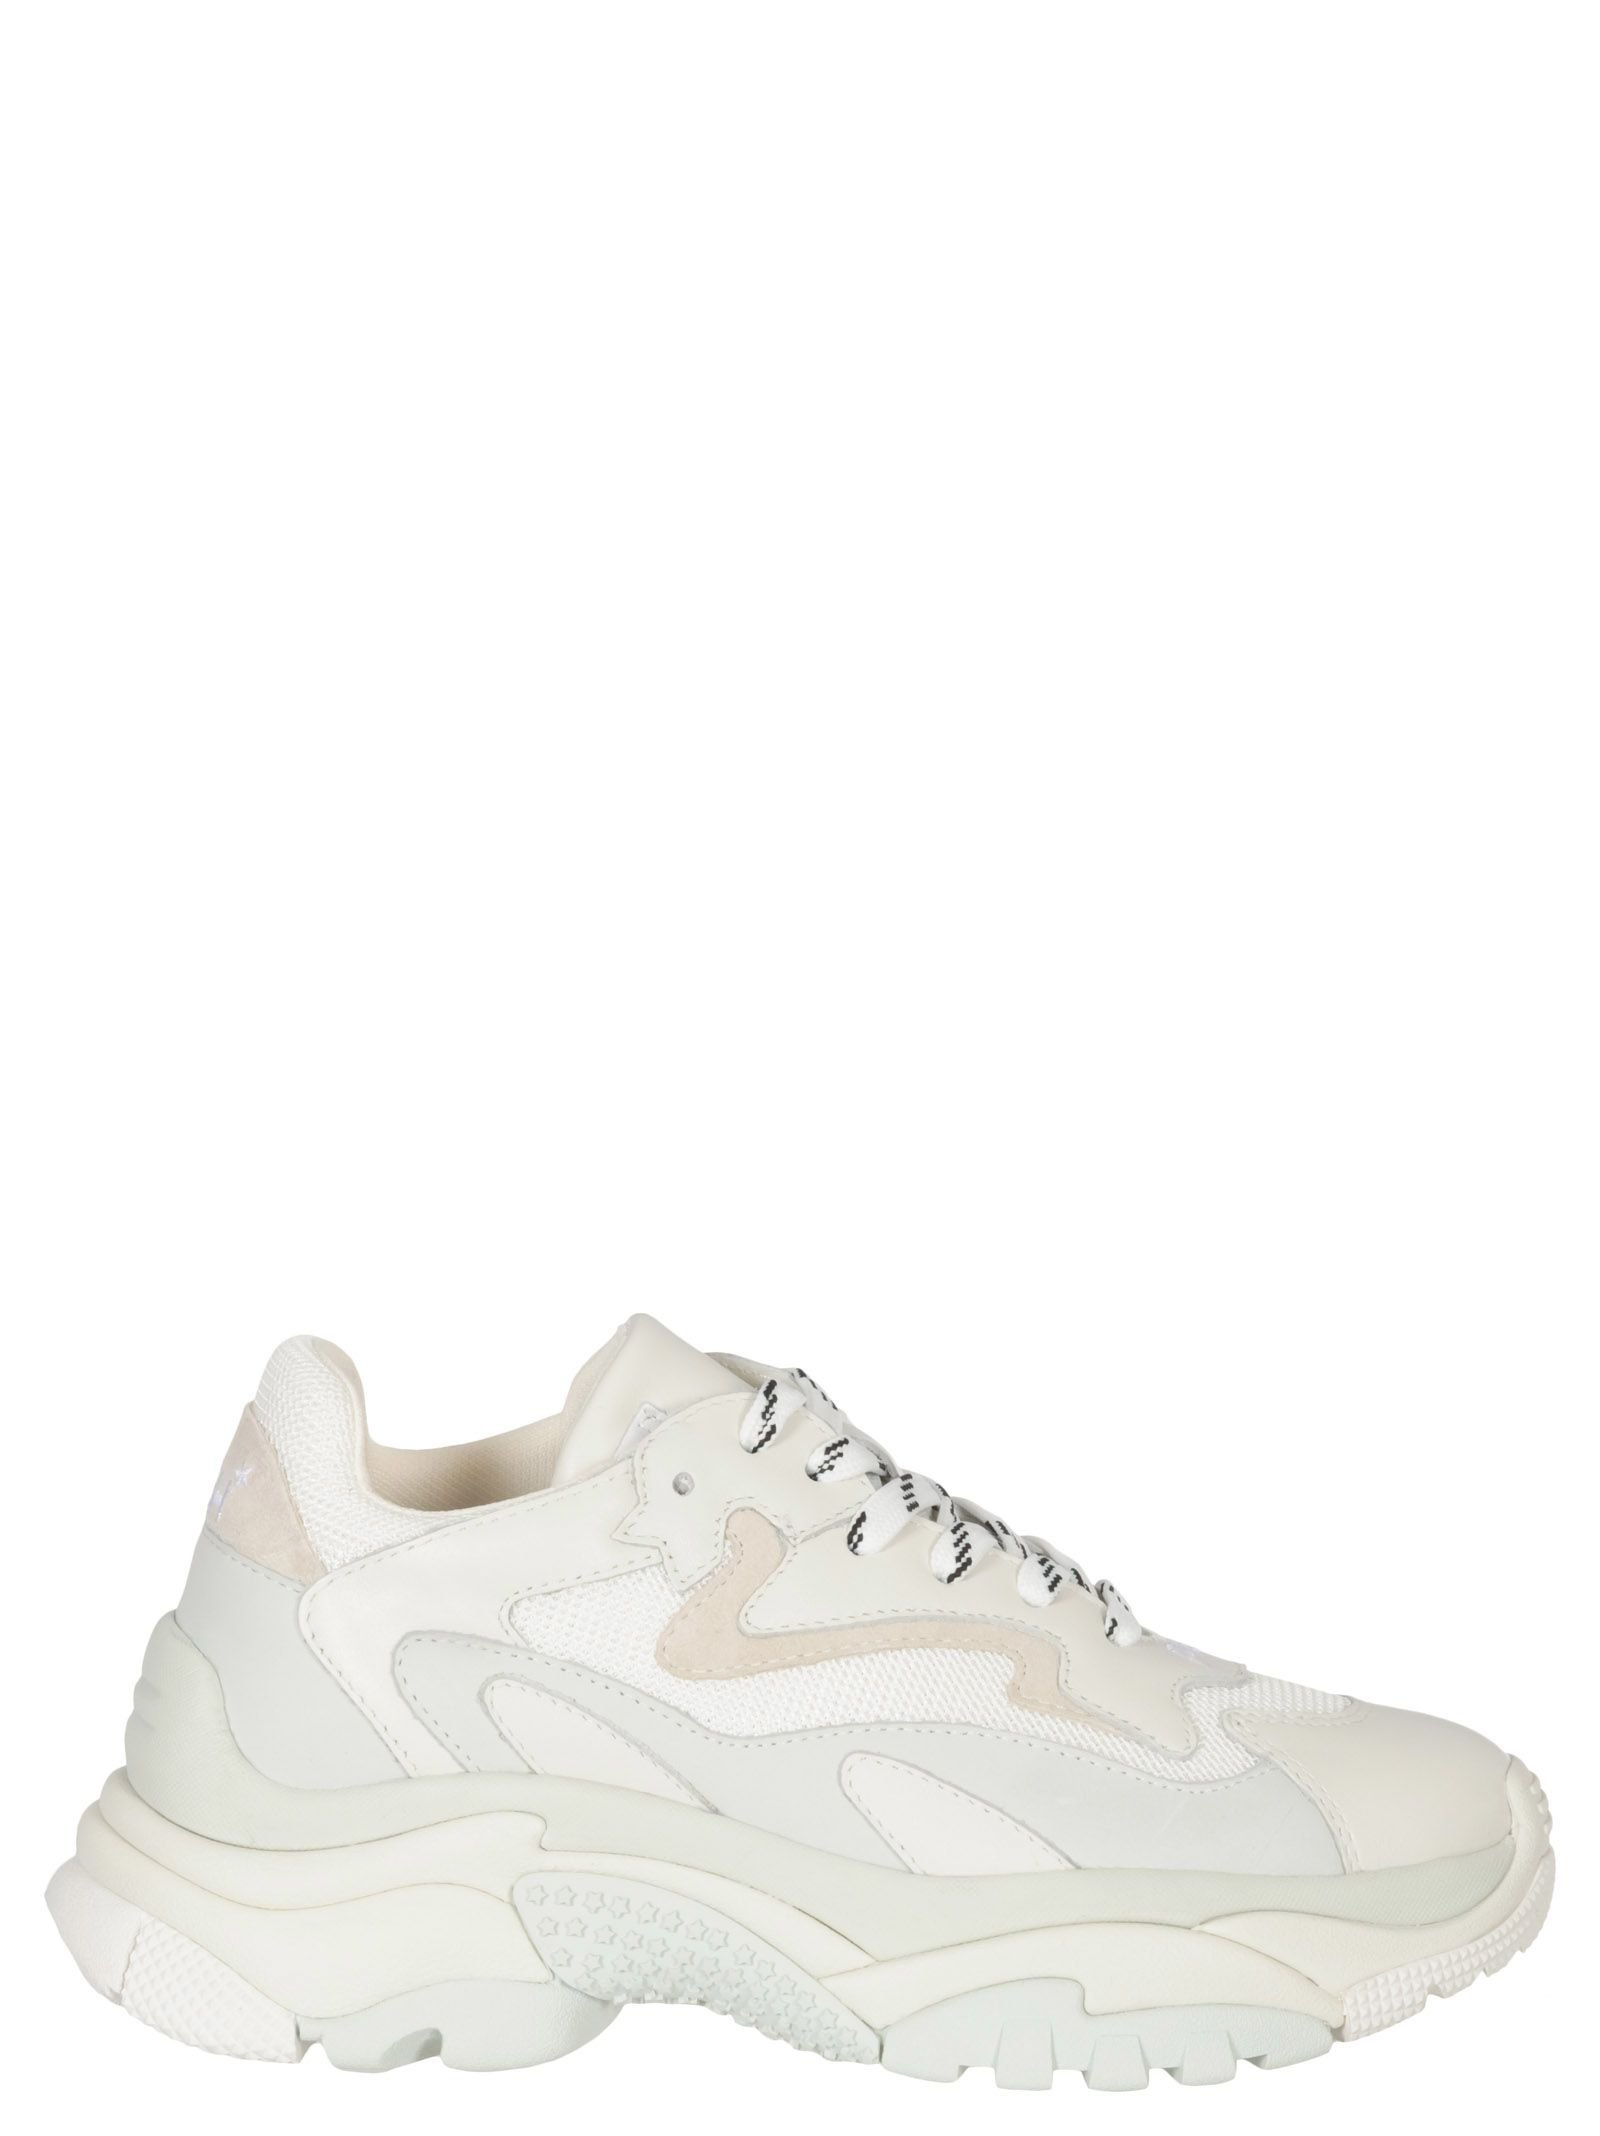 Ash Addict Sneakers